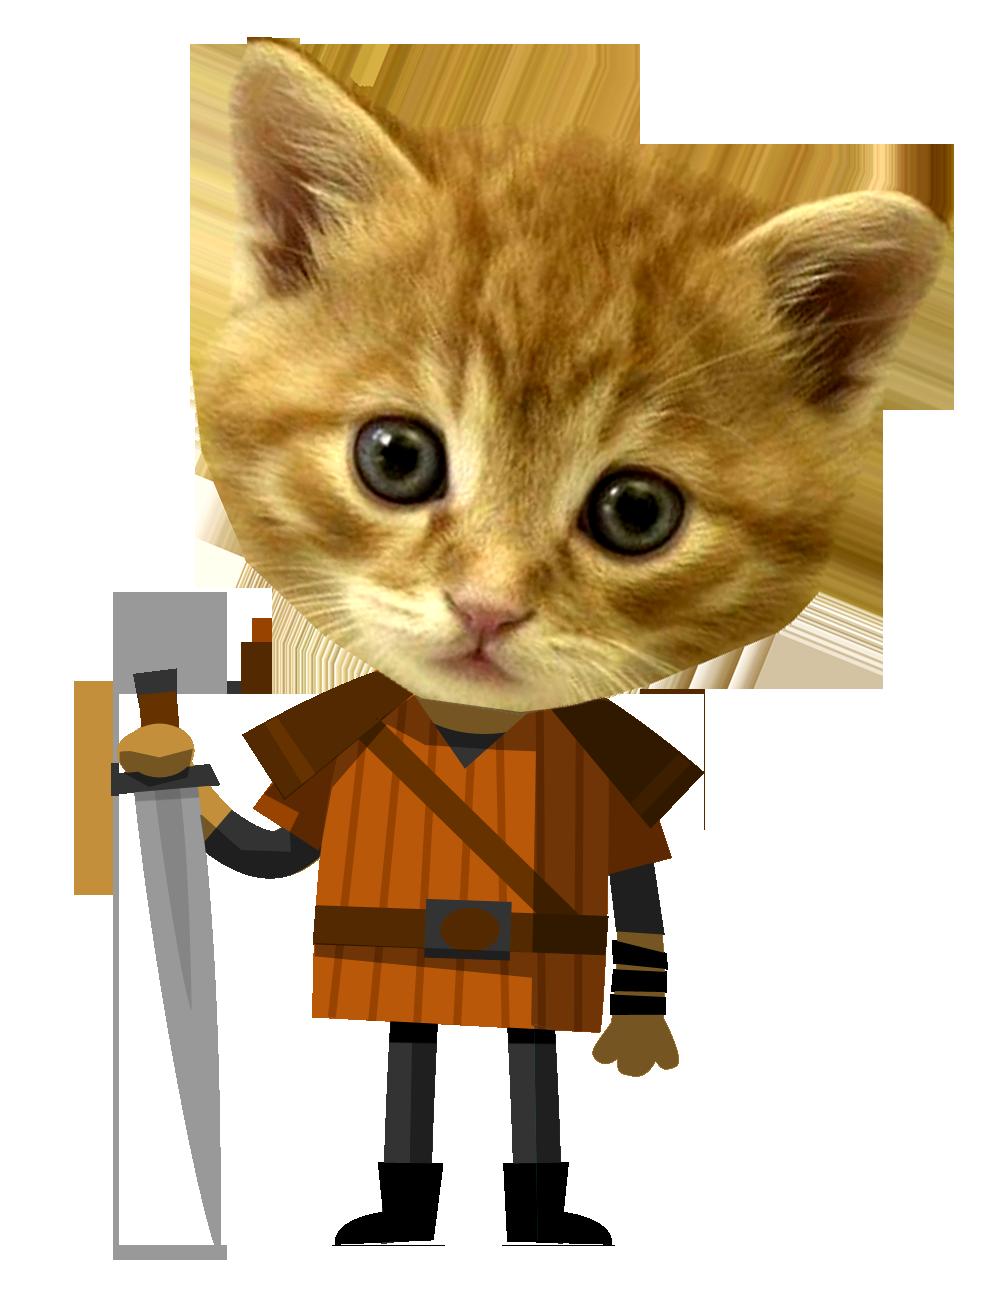 kitten-medieval-flat-copy-2.png